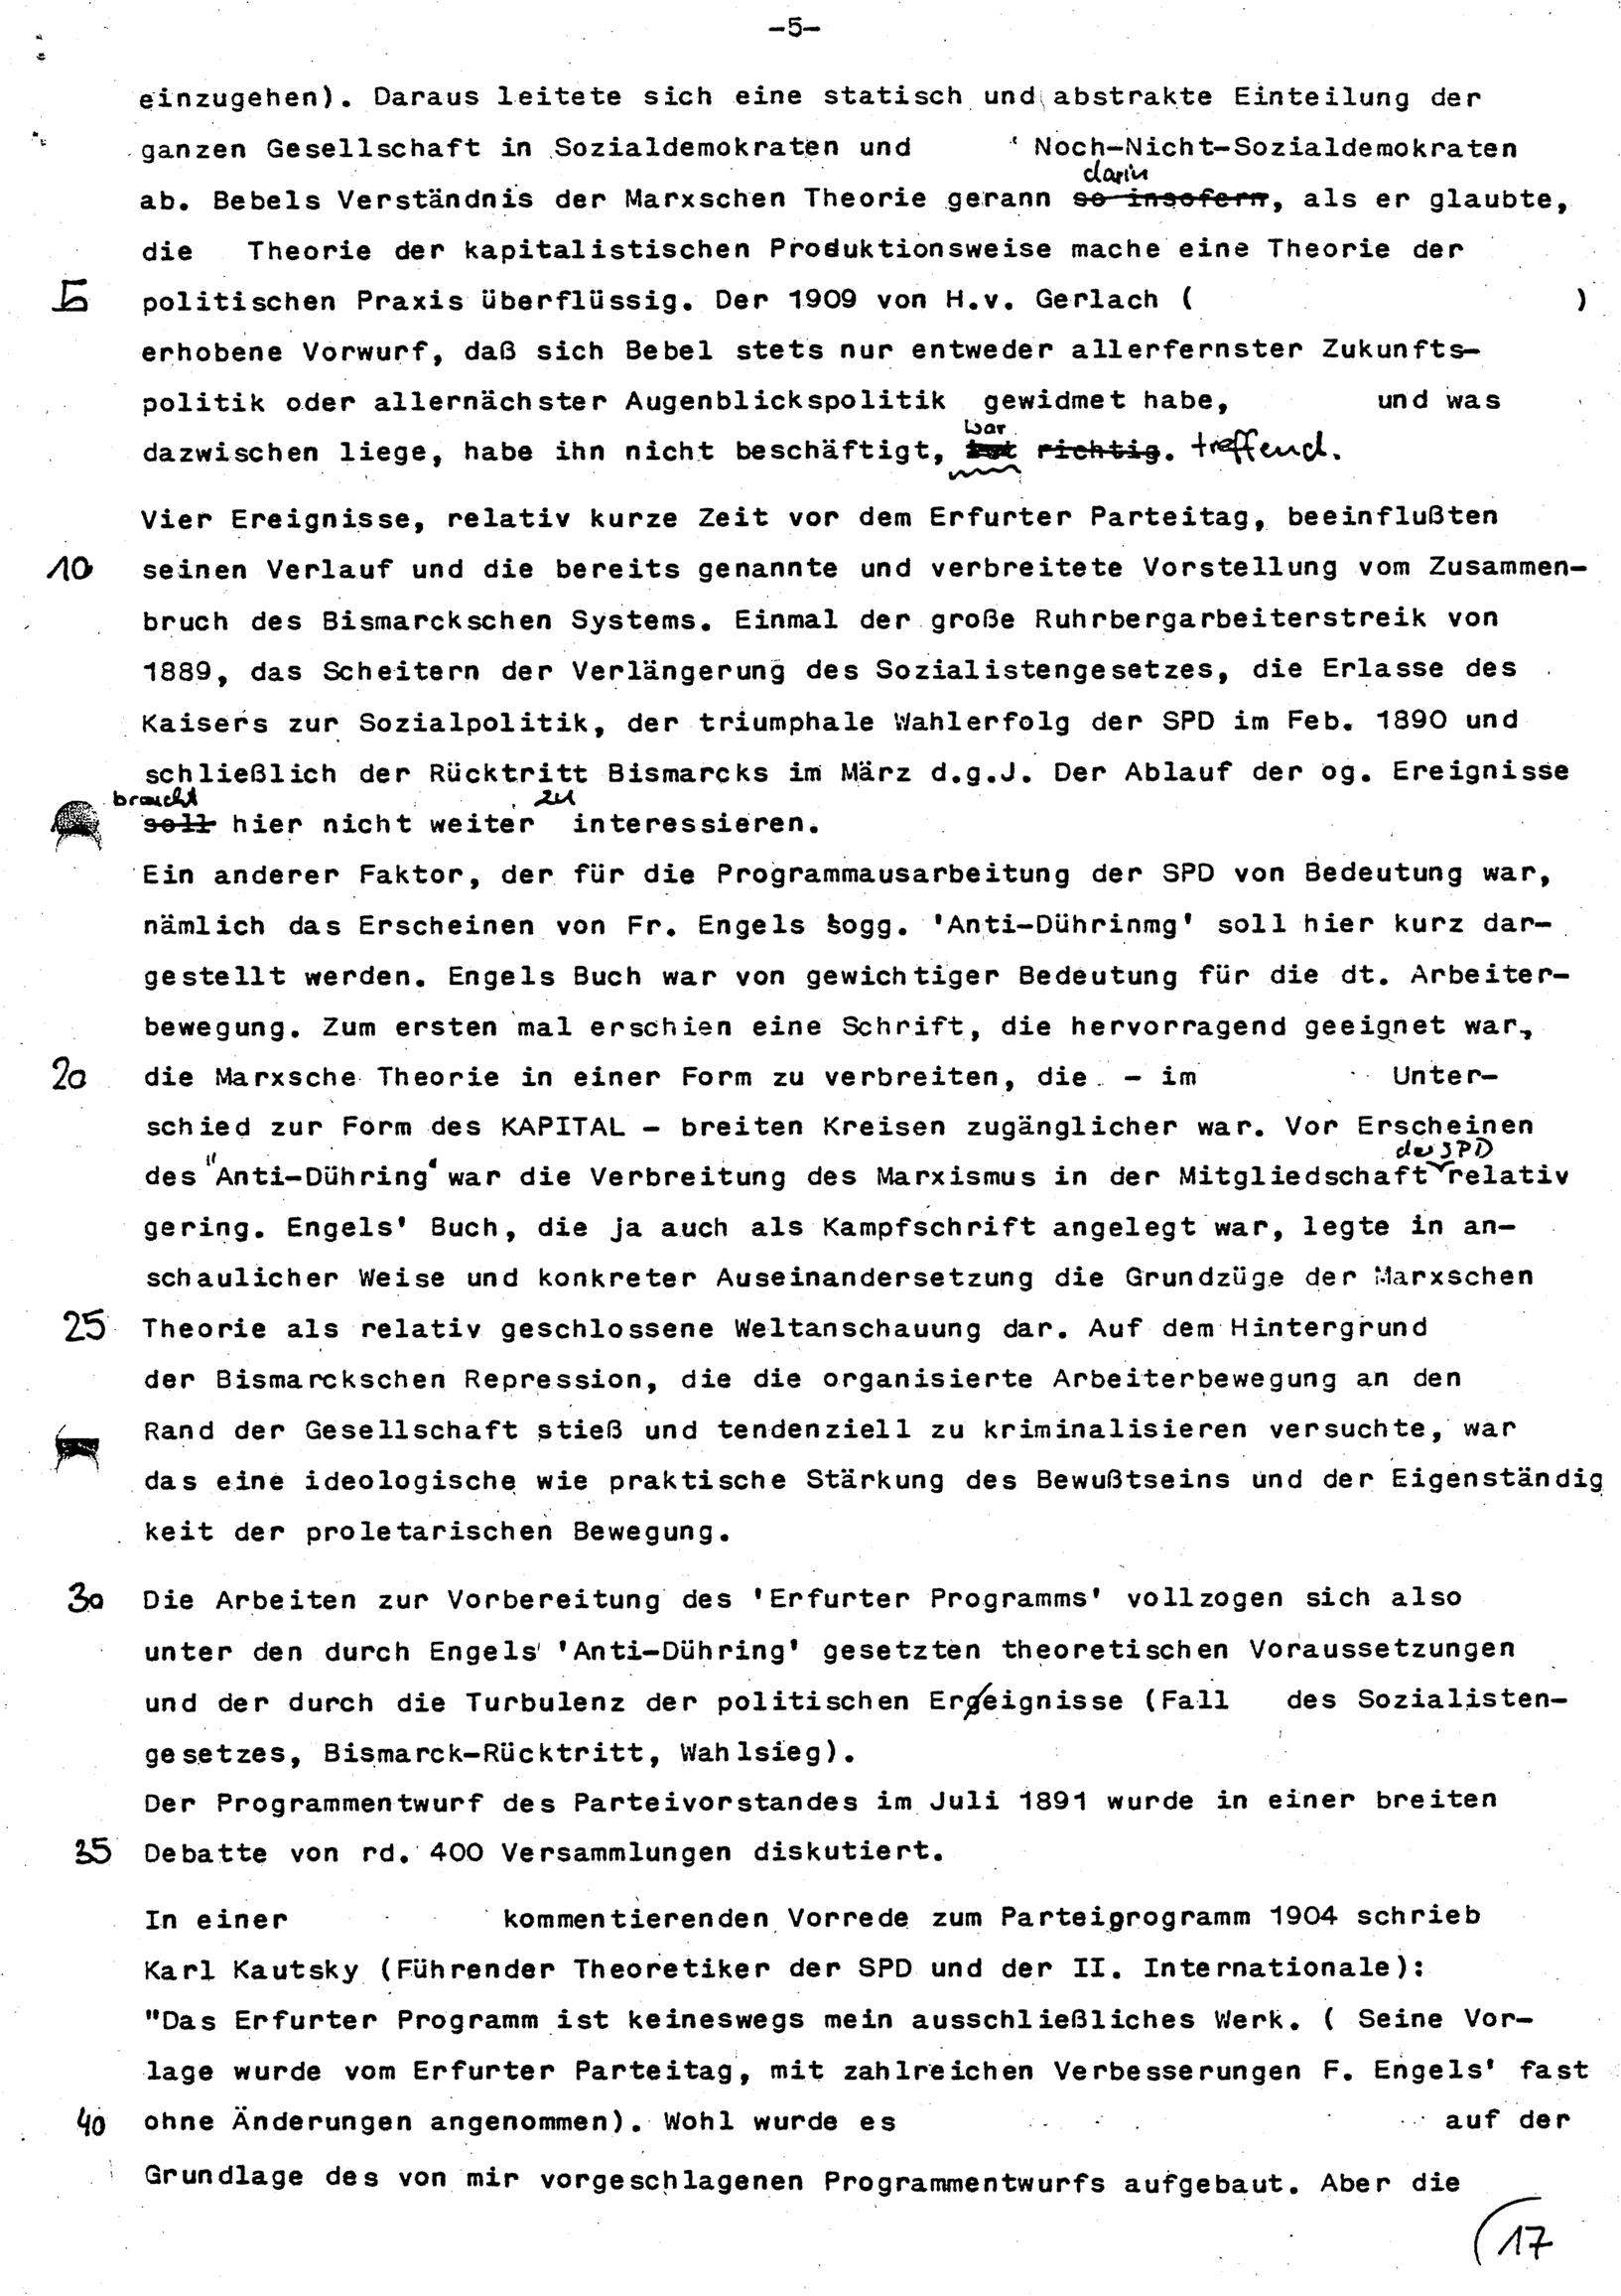 Ulm_KGU_Arbeitsheft_19830425_015_020